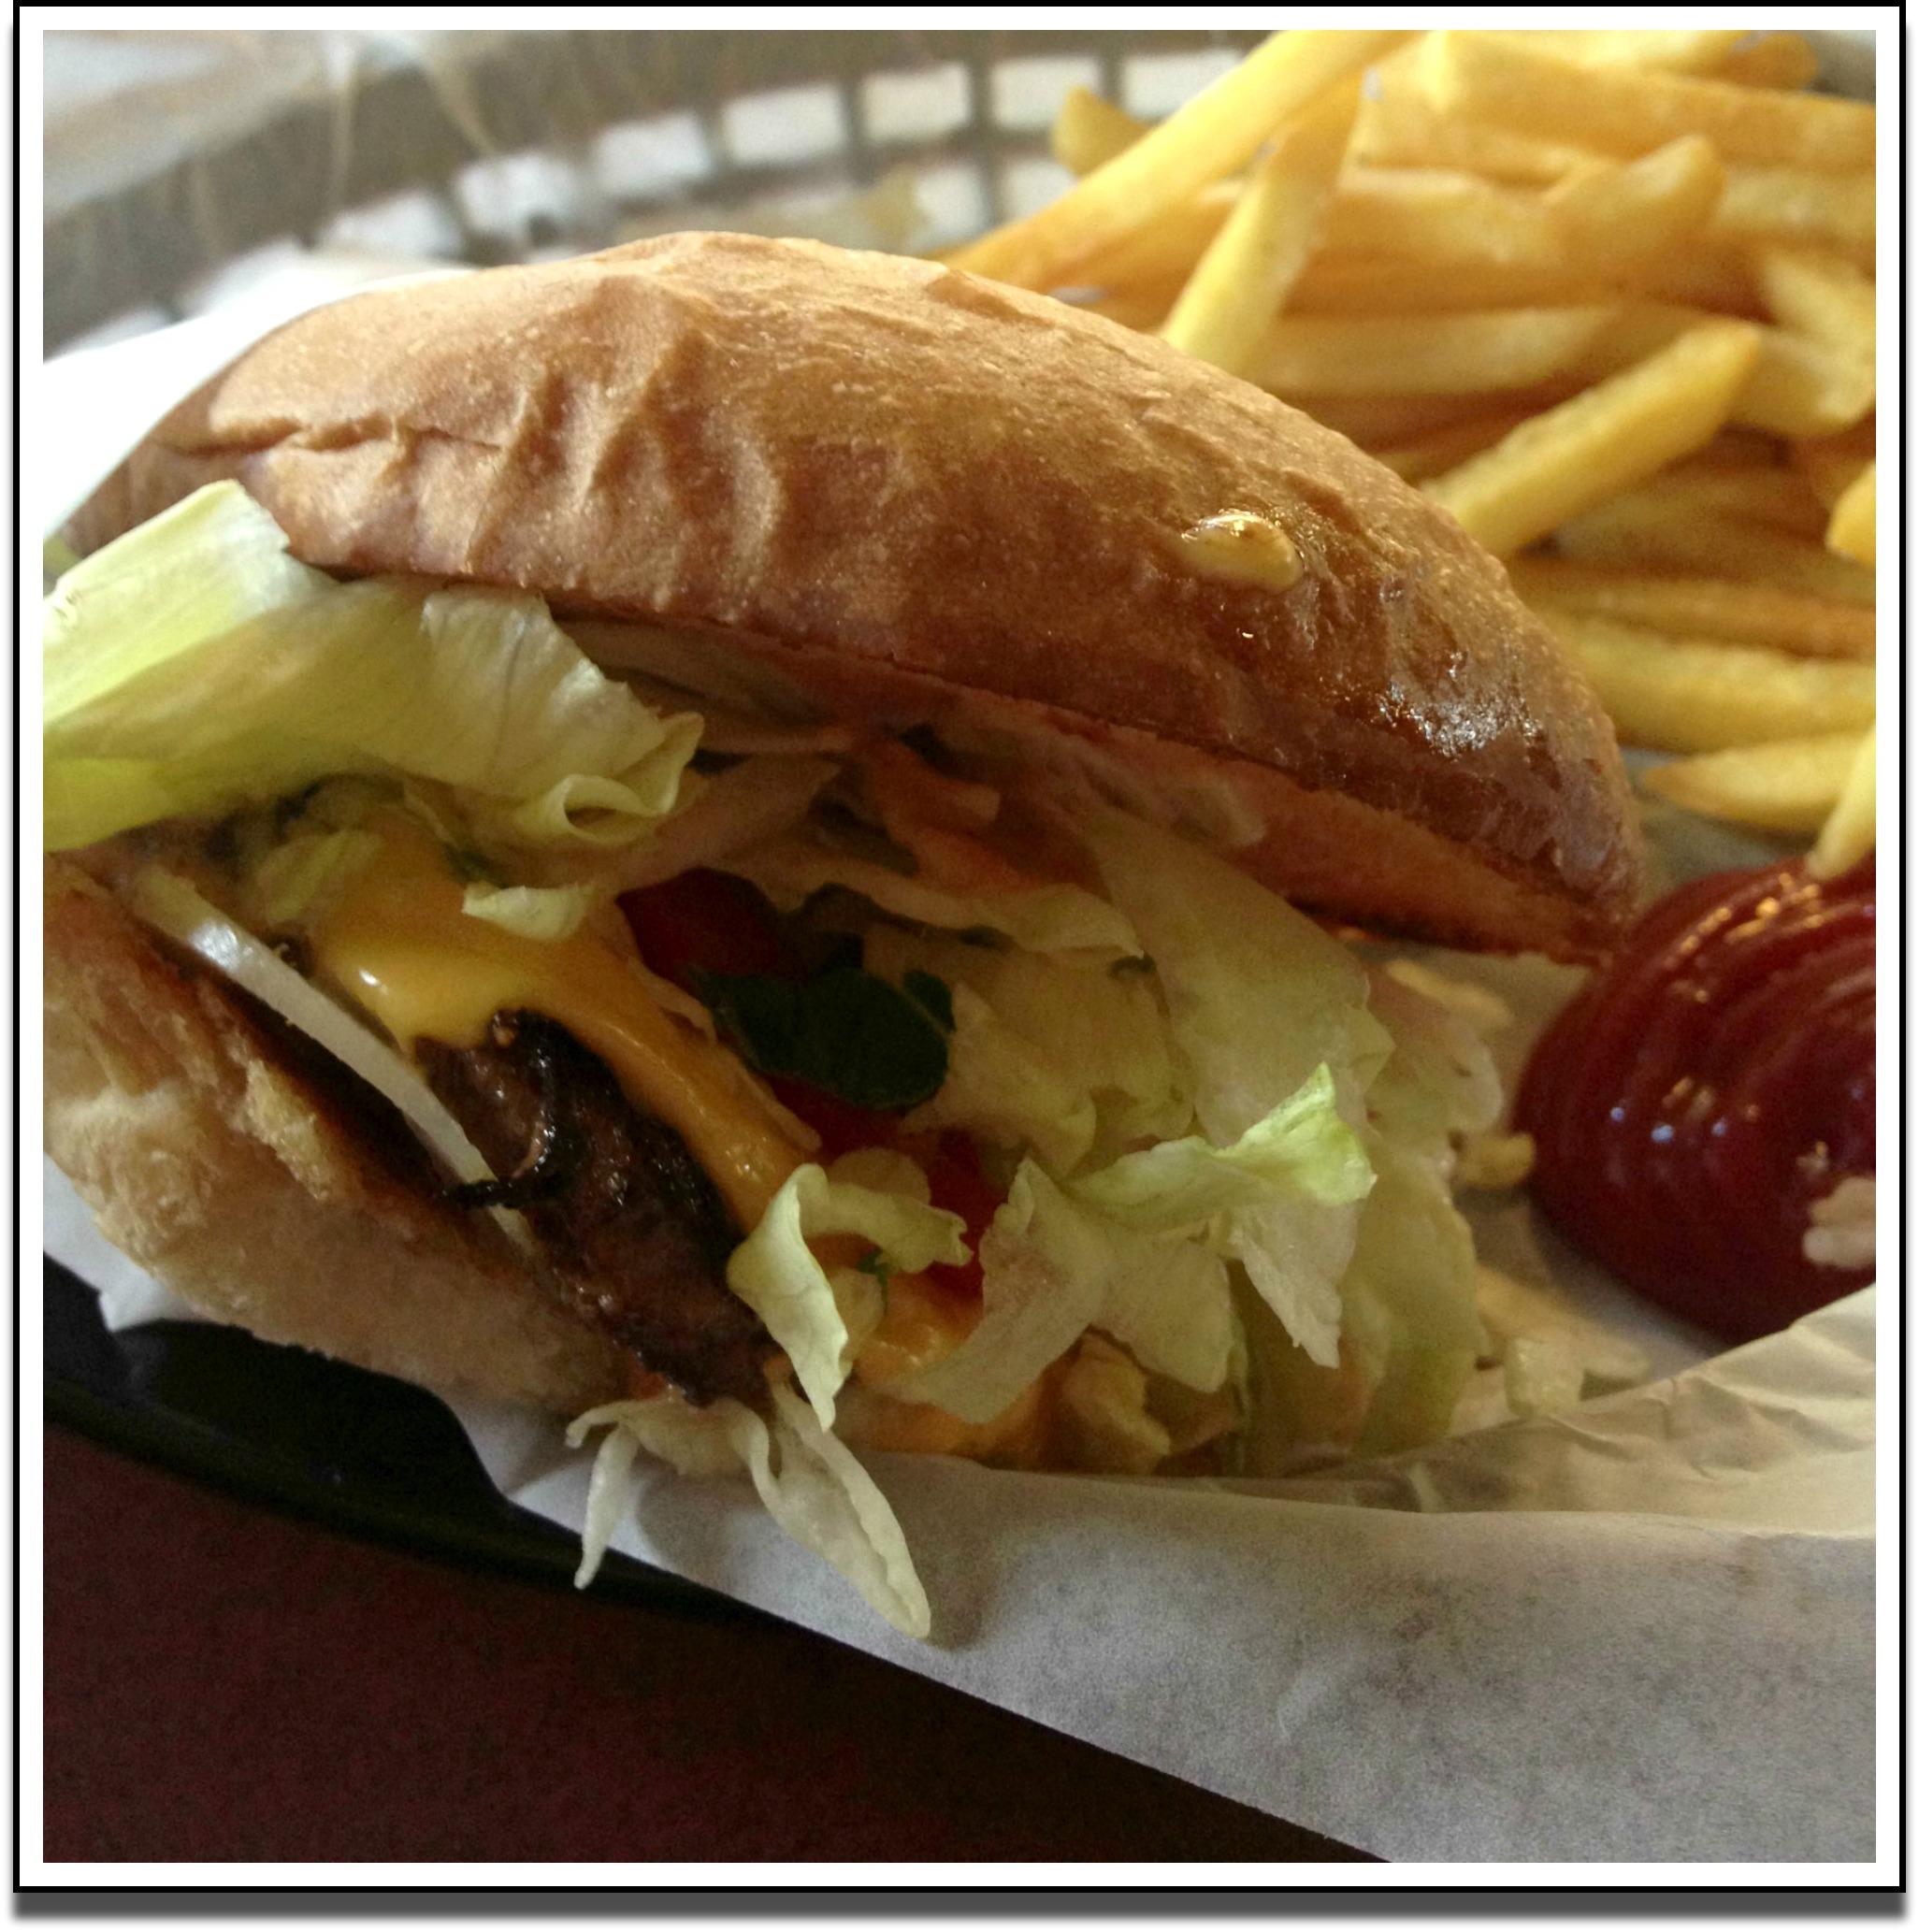 Dukes Burger